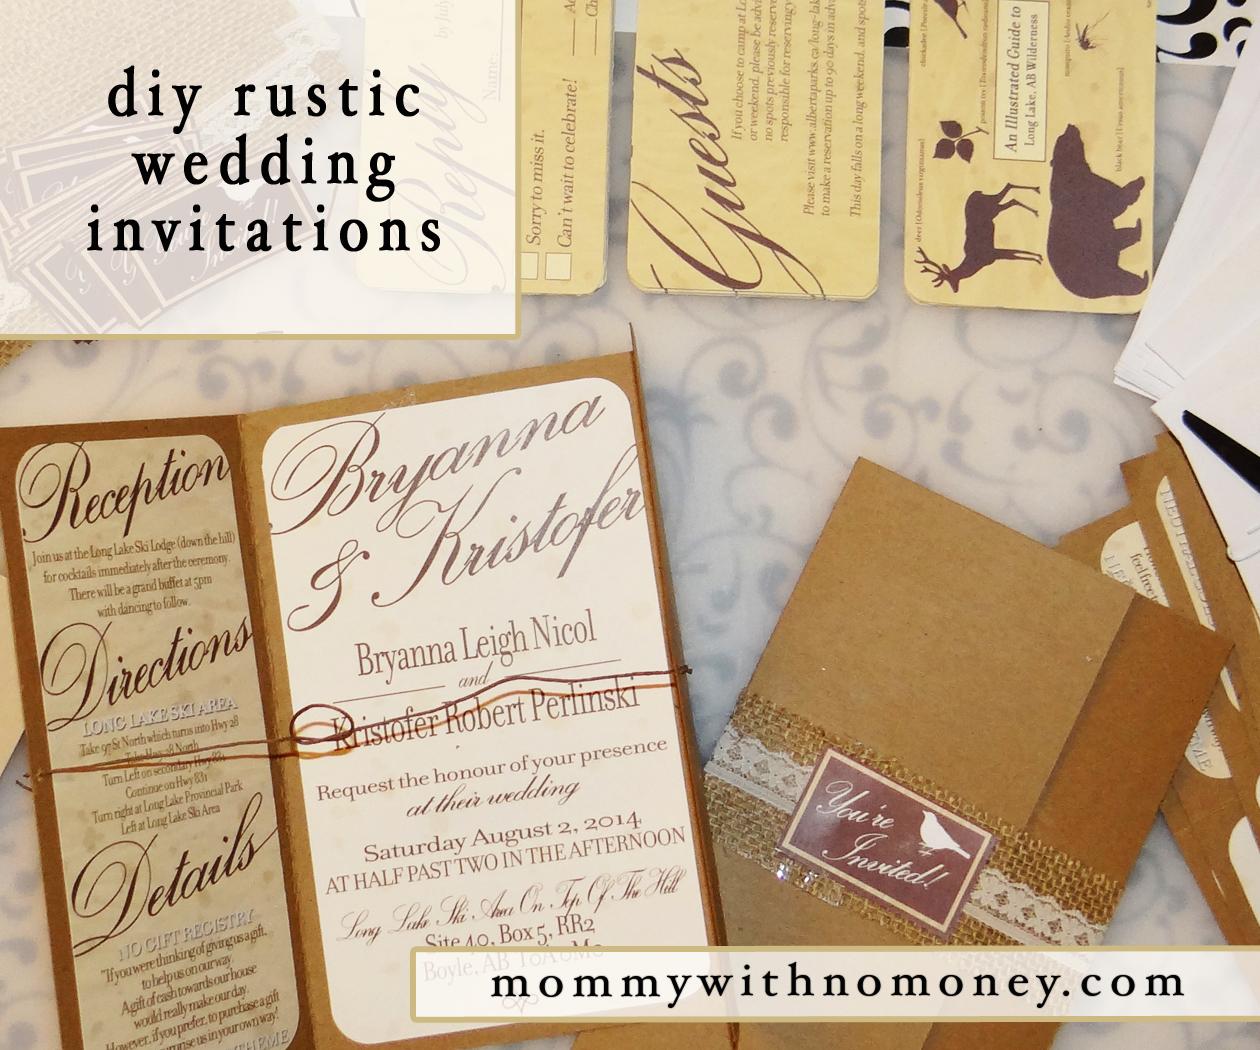 DIY Rustic Wedding Invites.jpg